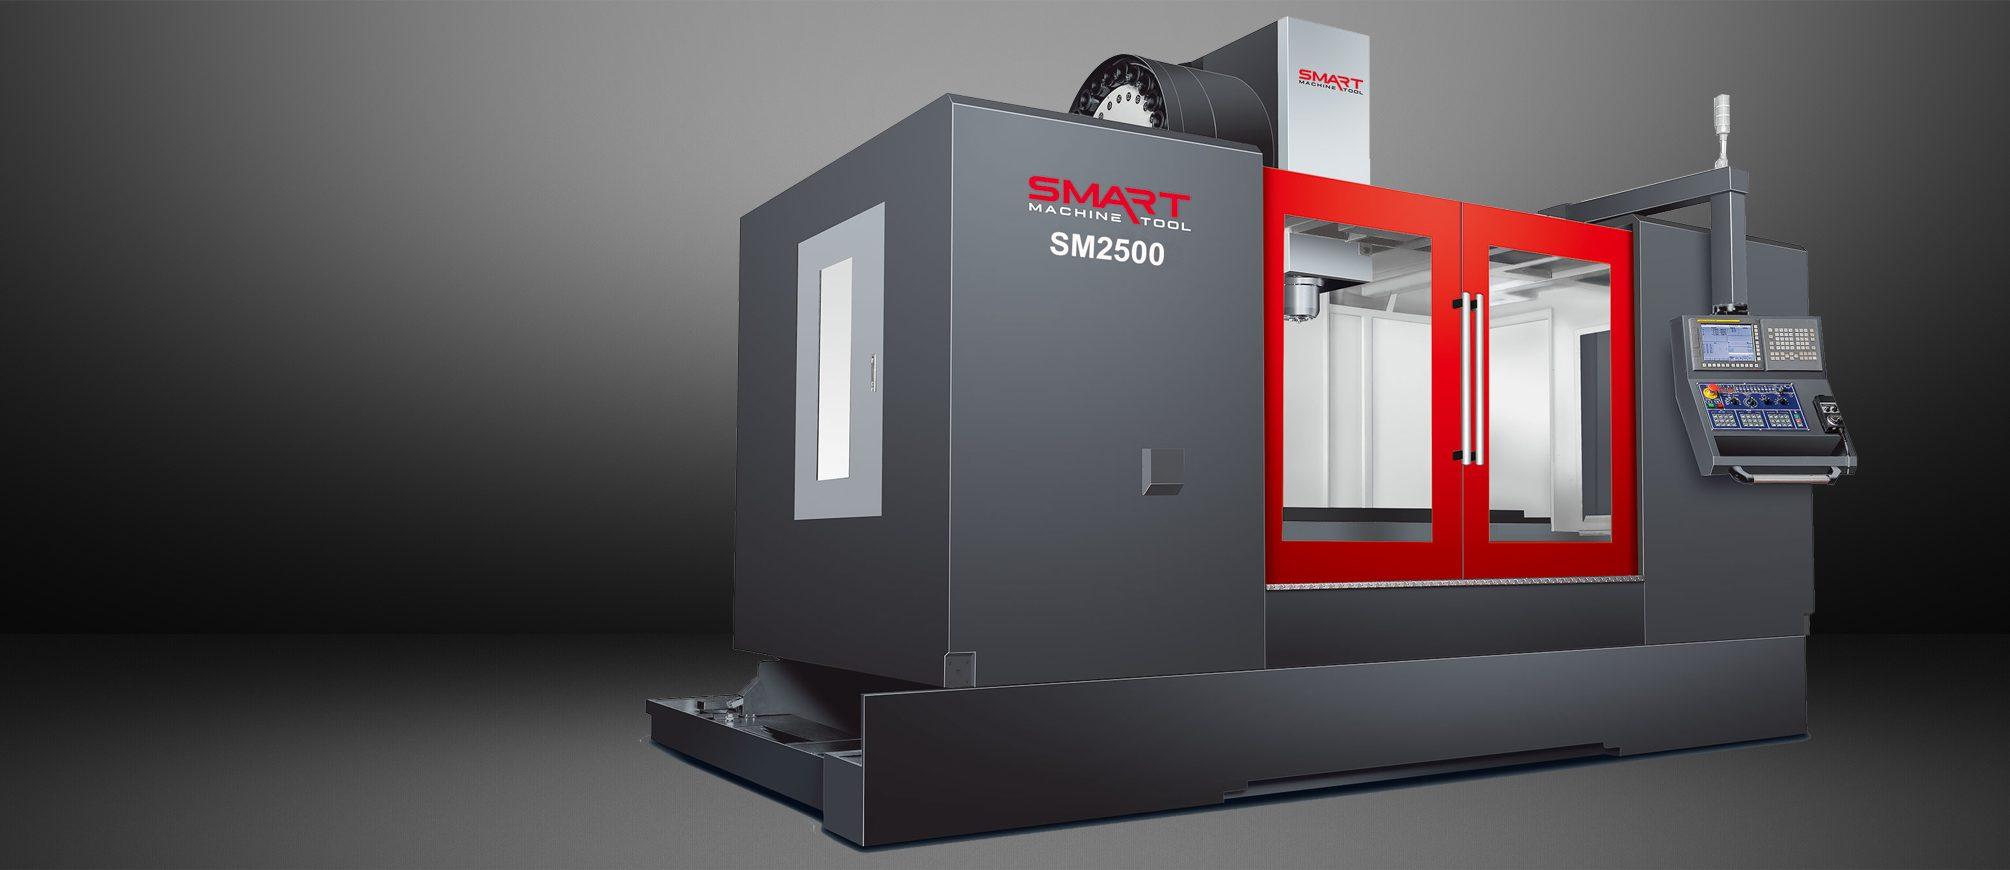 SMART SM 2500 – BOX WAY – (CAT50, 6K) Vertical Machining Centers